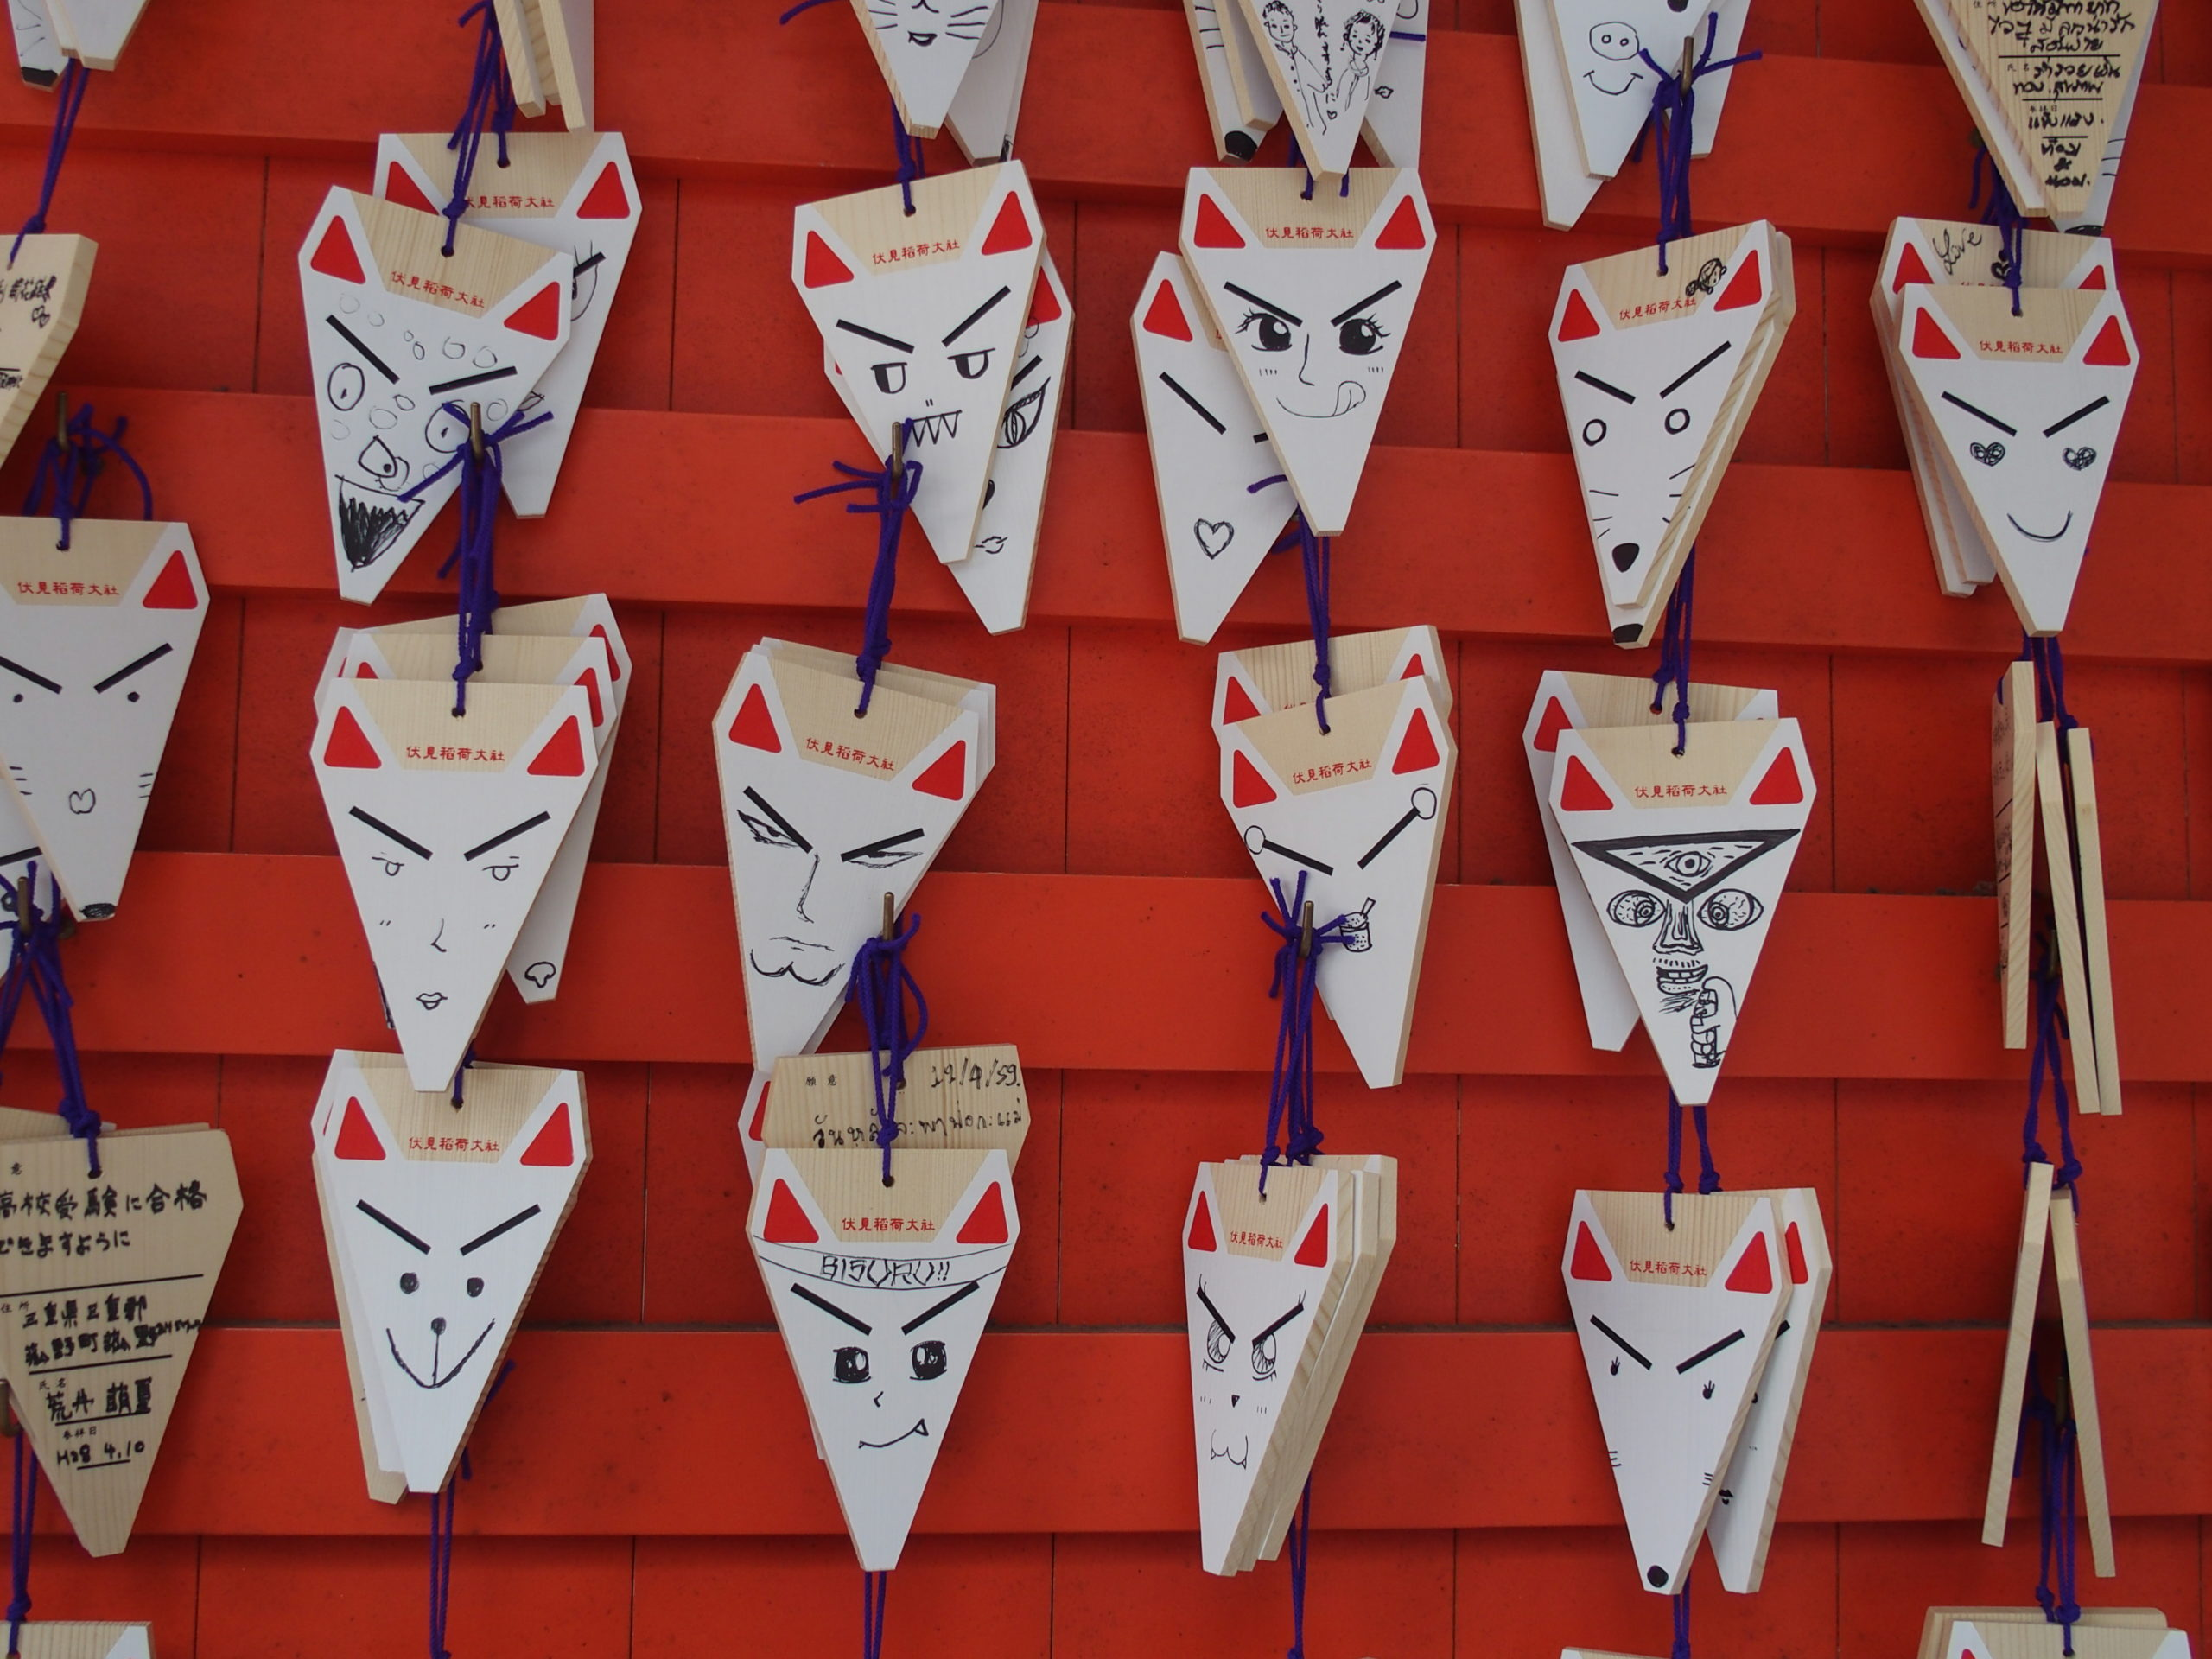 Tablettes votives en forme de tête de renard temple Kiyomizu-Dera Kyoto